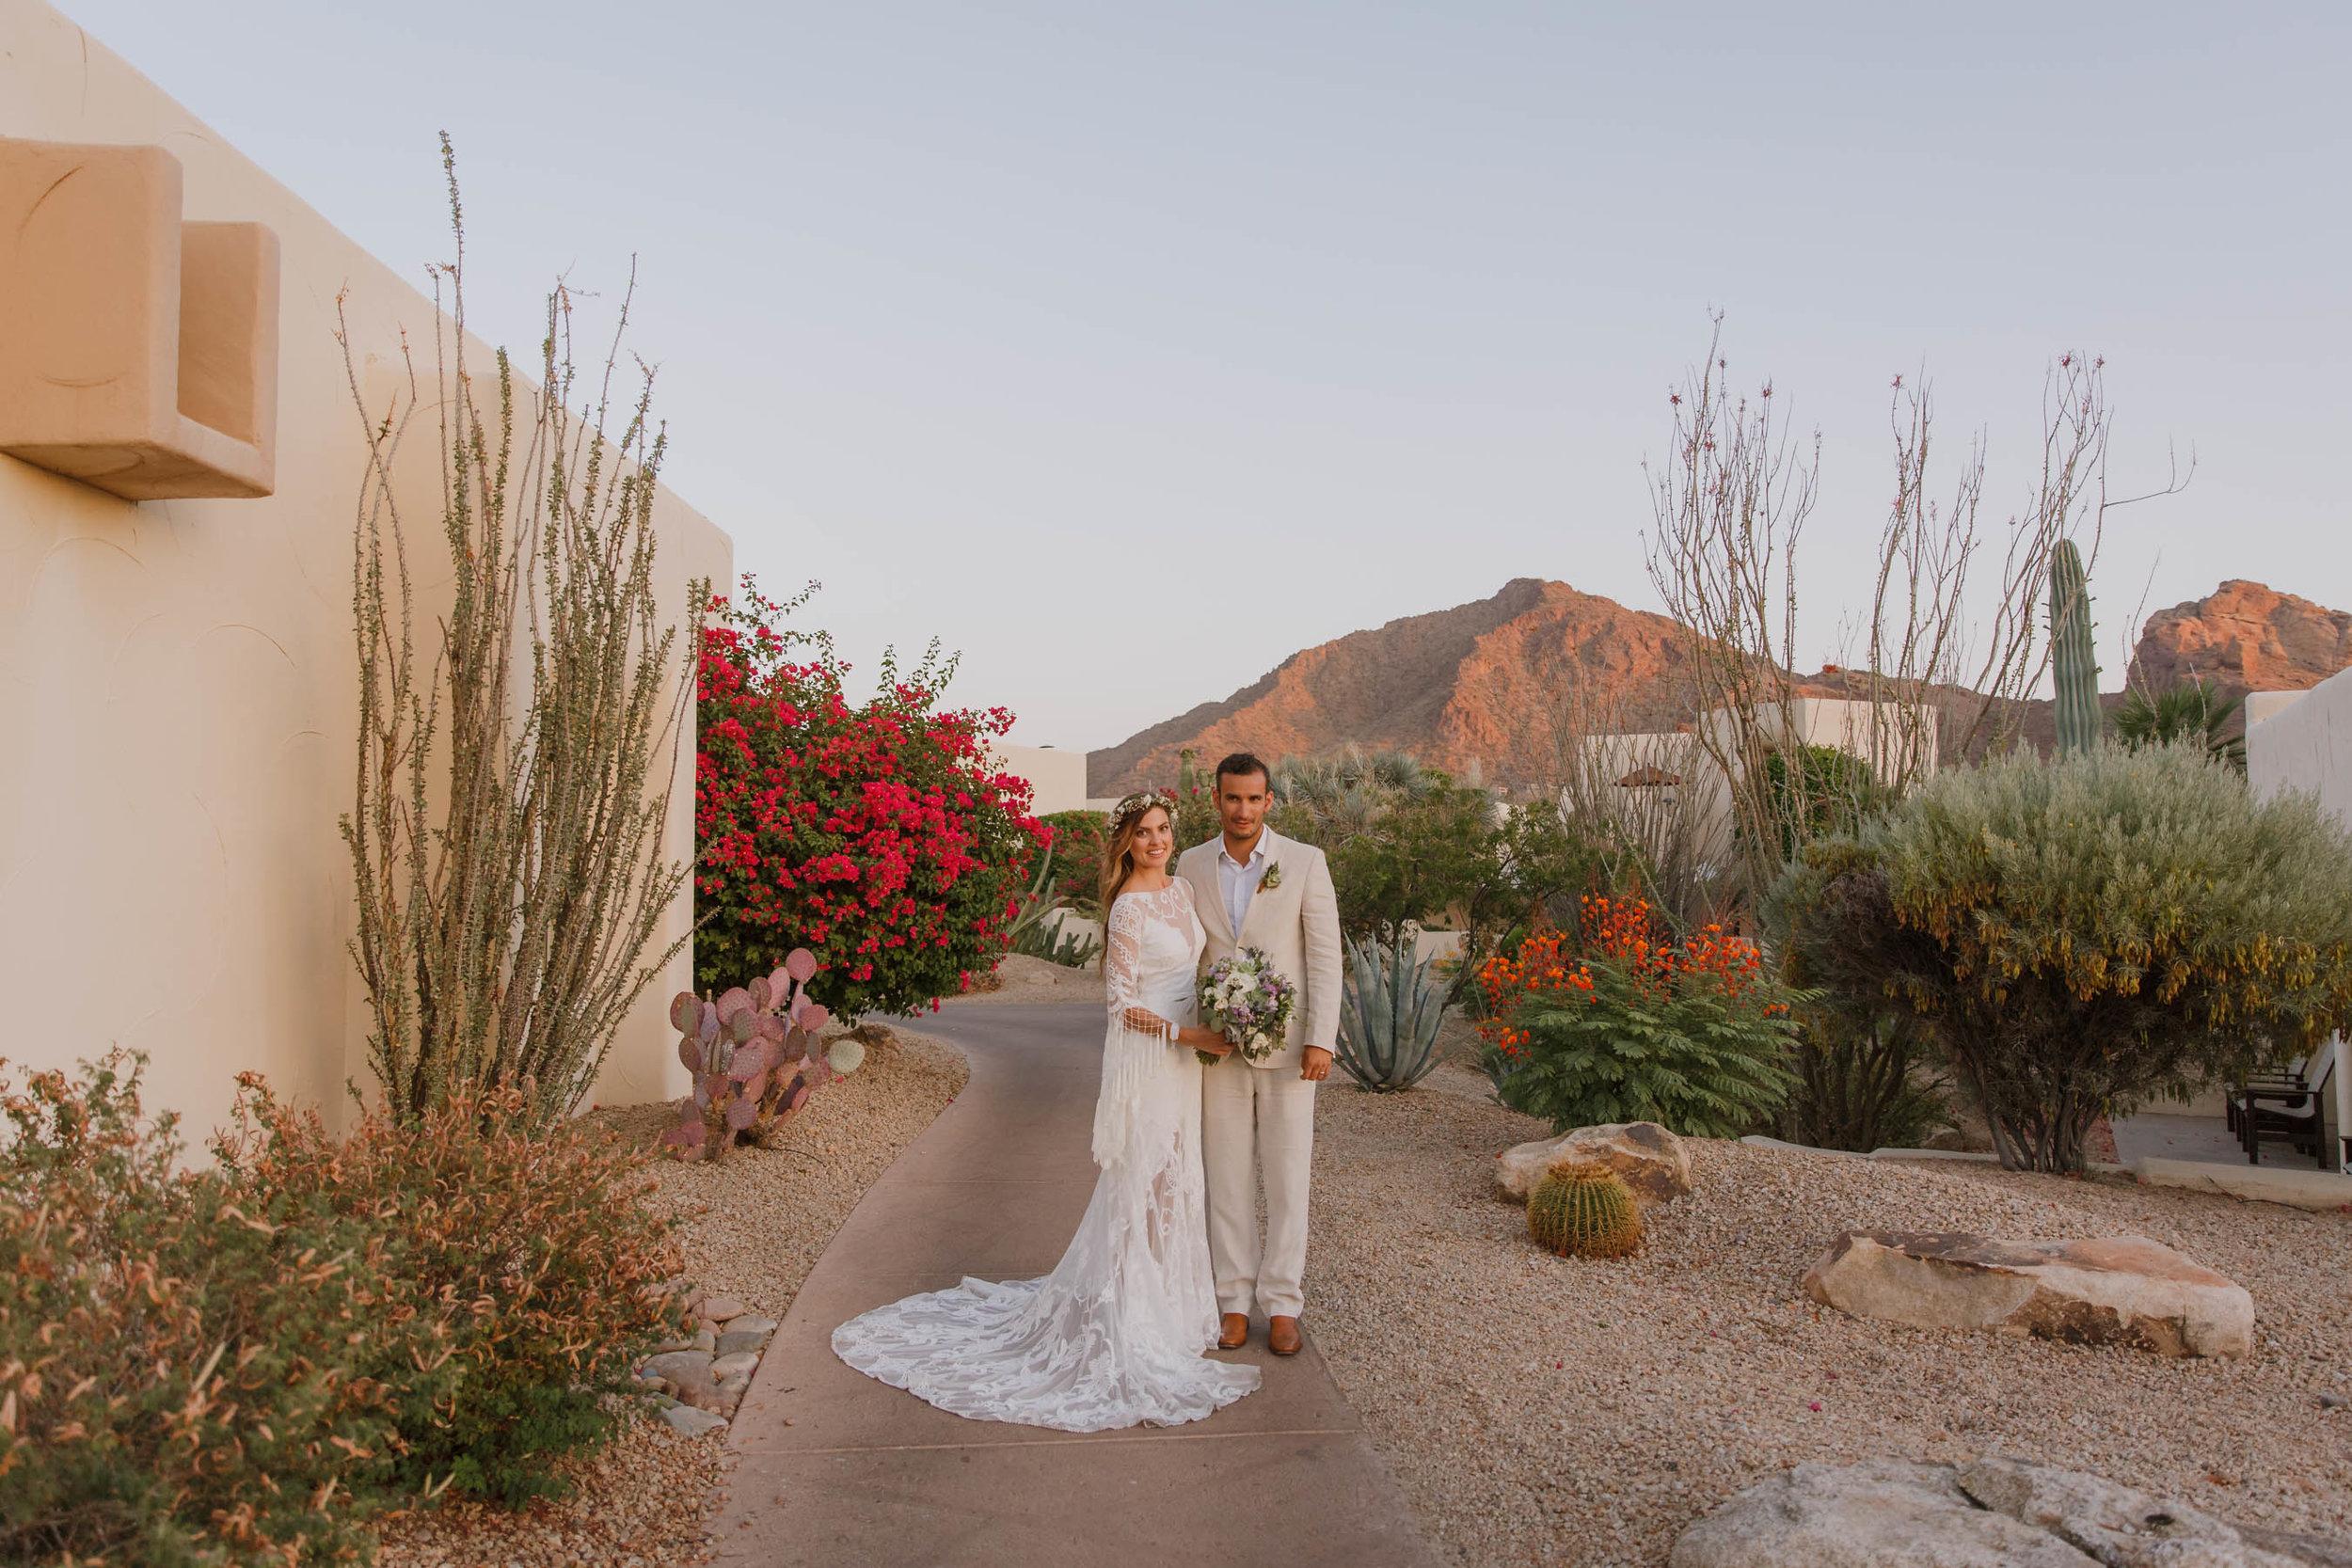 arizona-bohemian-wedding-photographer-elizabeth-tsung-photo-73.jpg